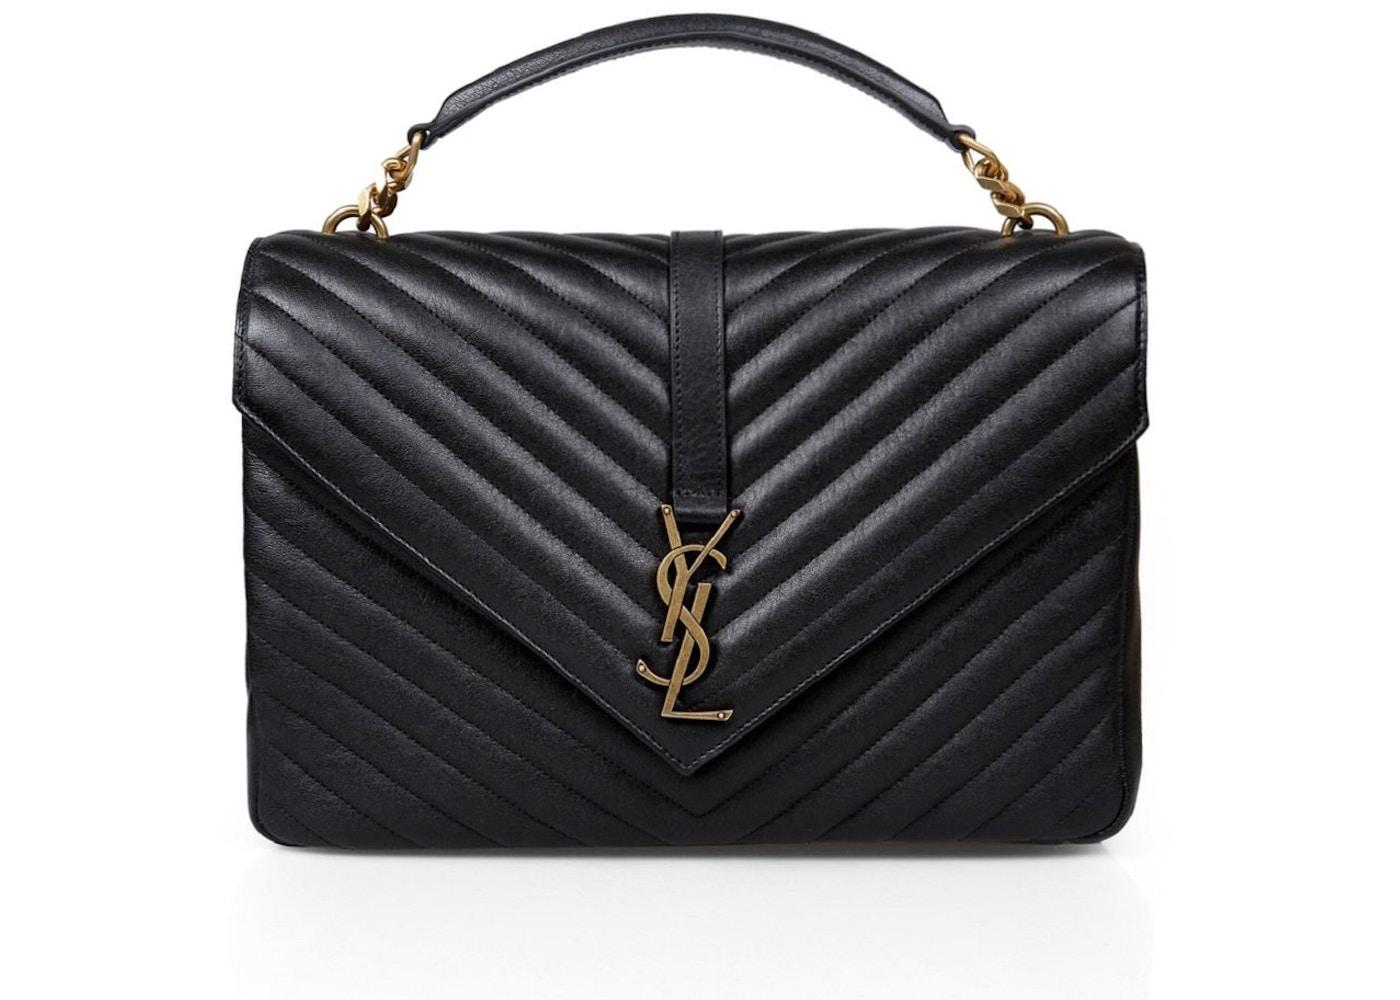 Saint Laurent Monogram Matelasse Chain-Strap Shoulder Bag